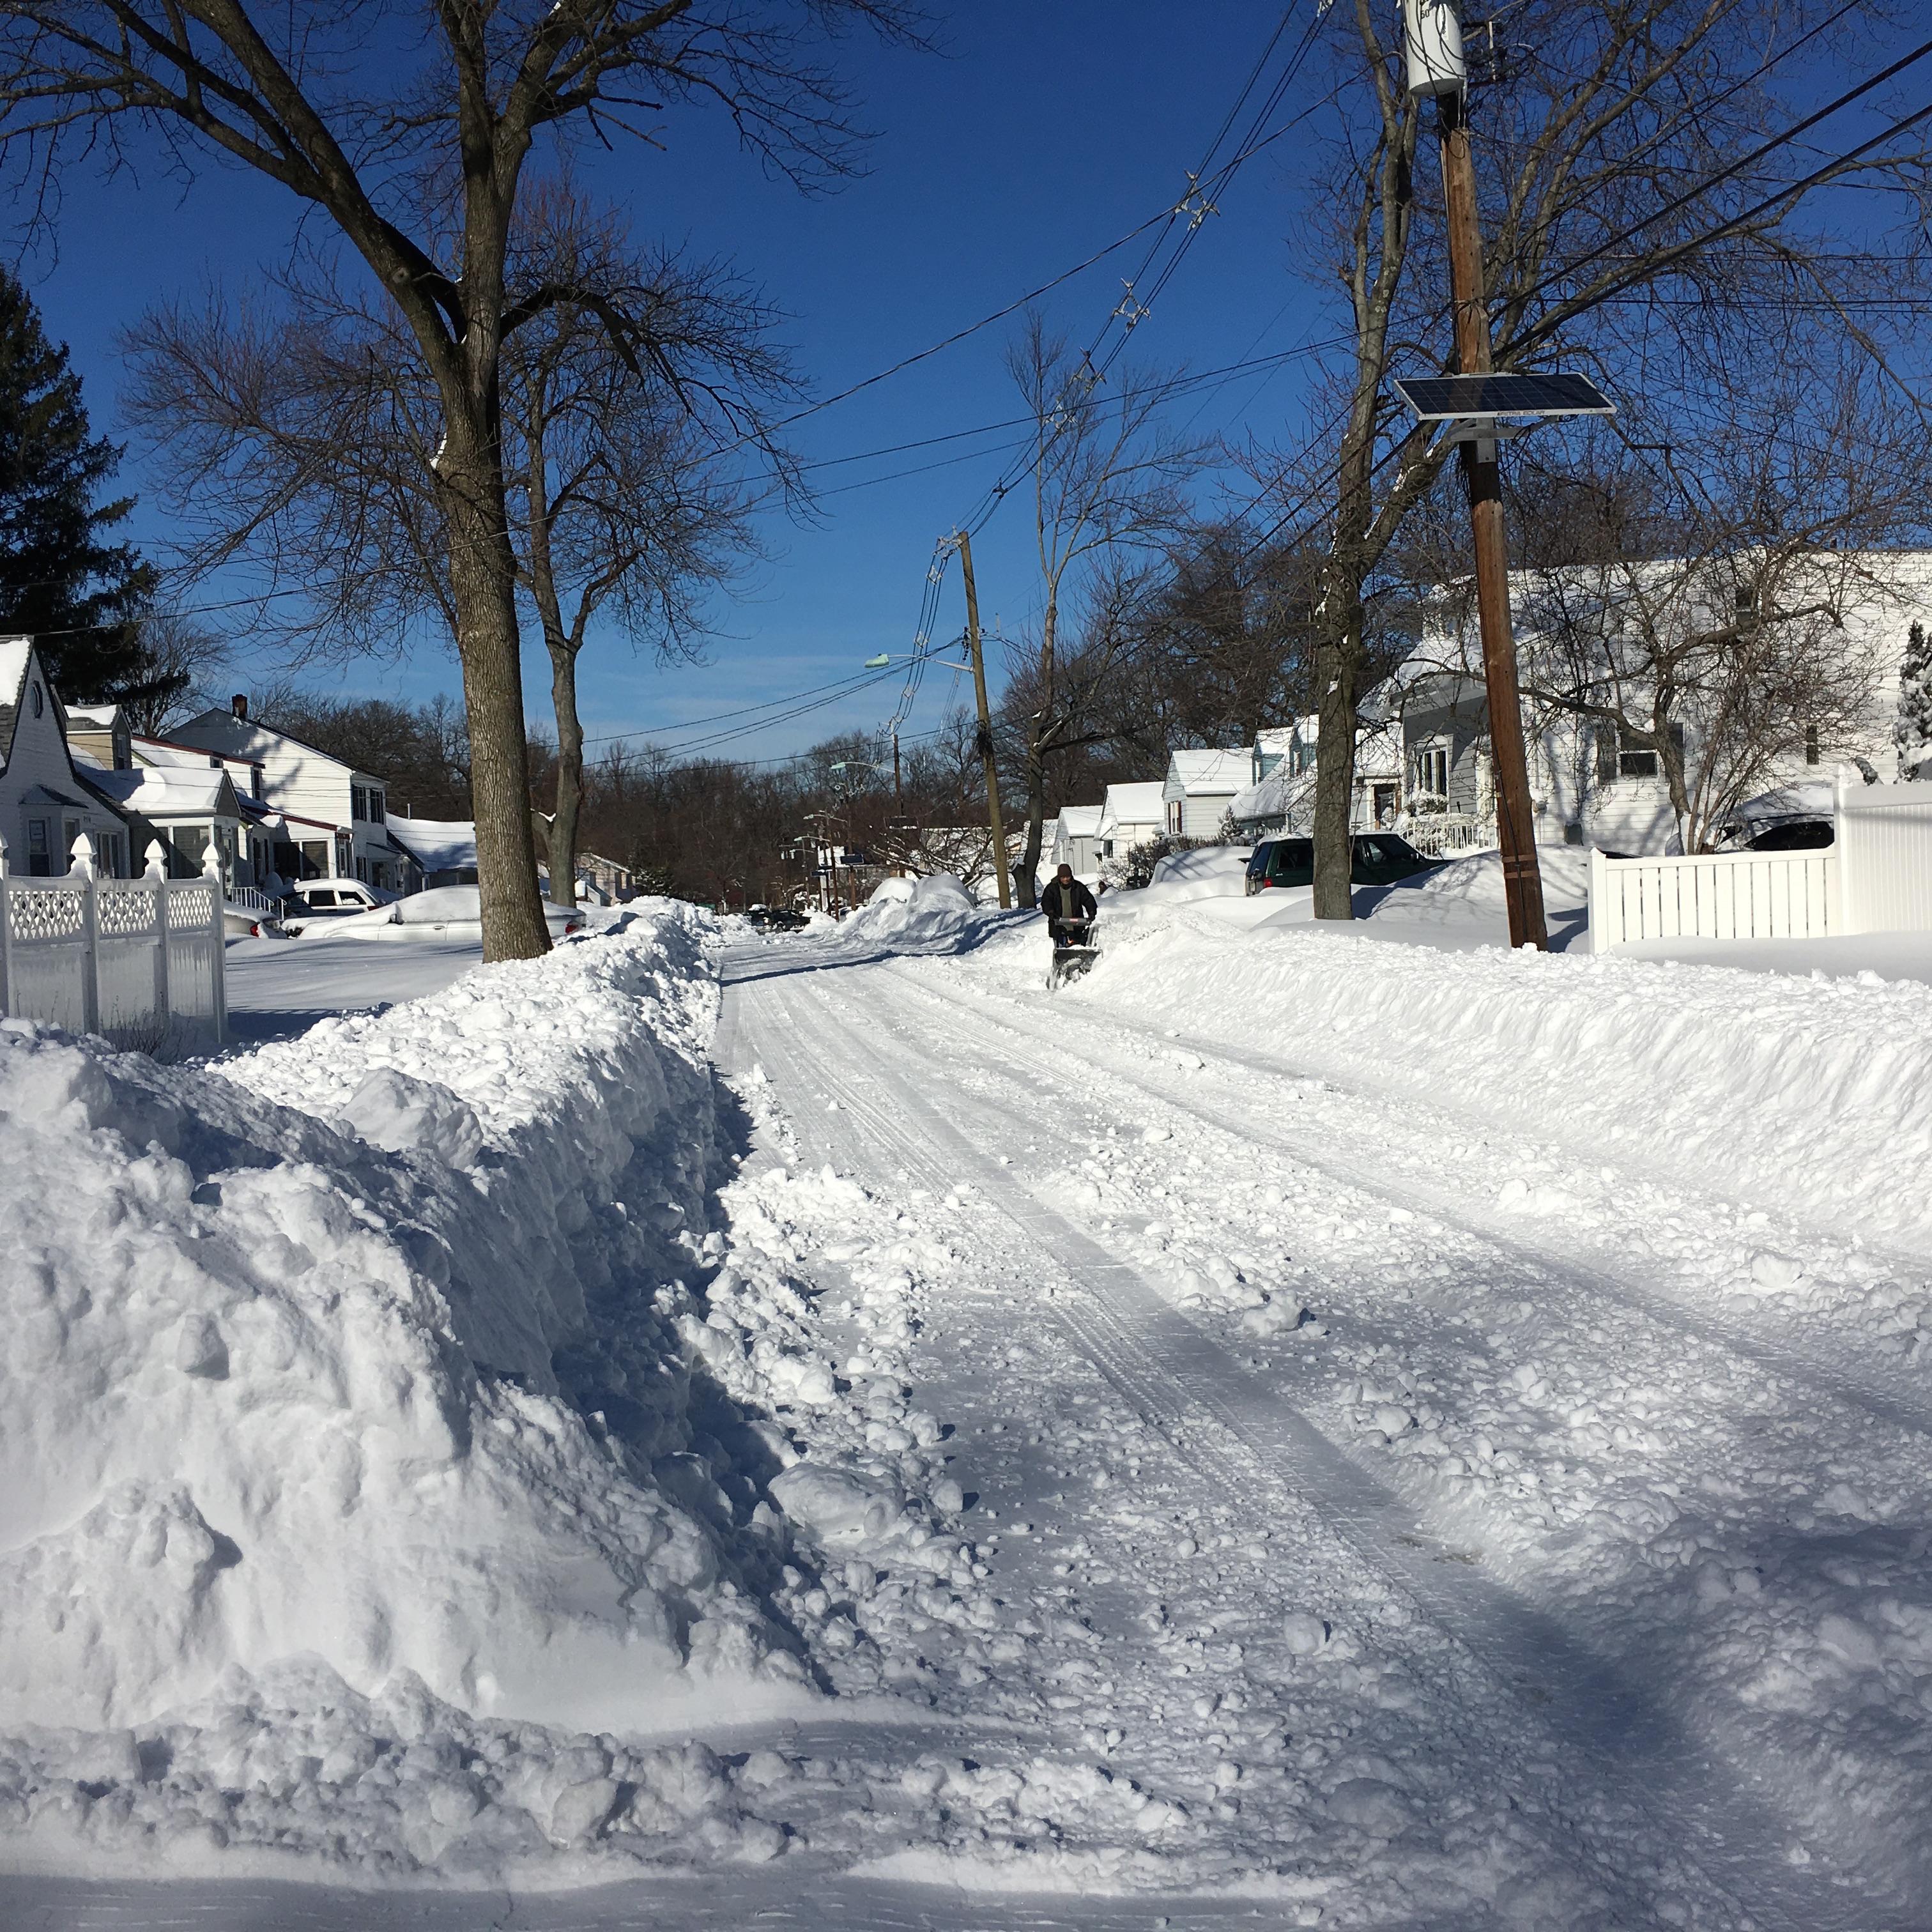 fd0557b558ba9c6a0ac3_snow_1-24_1.jpg